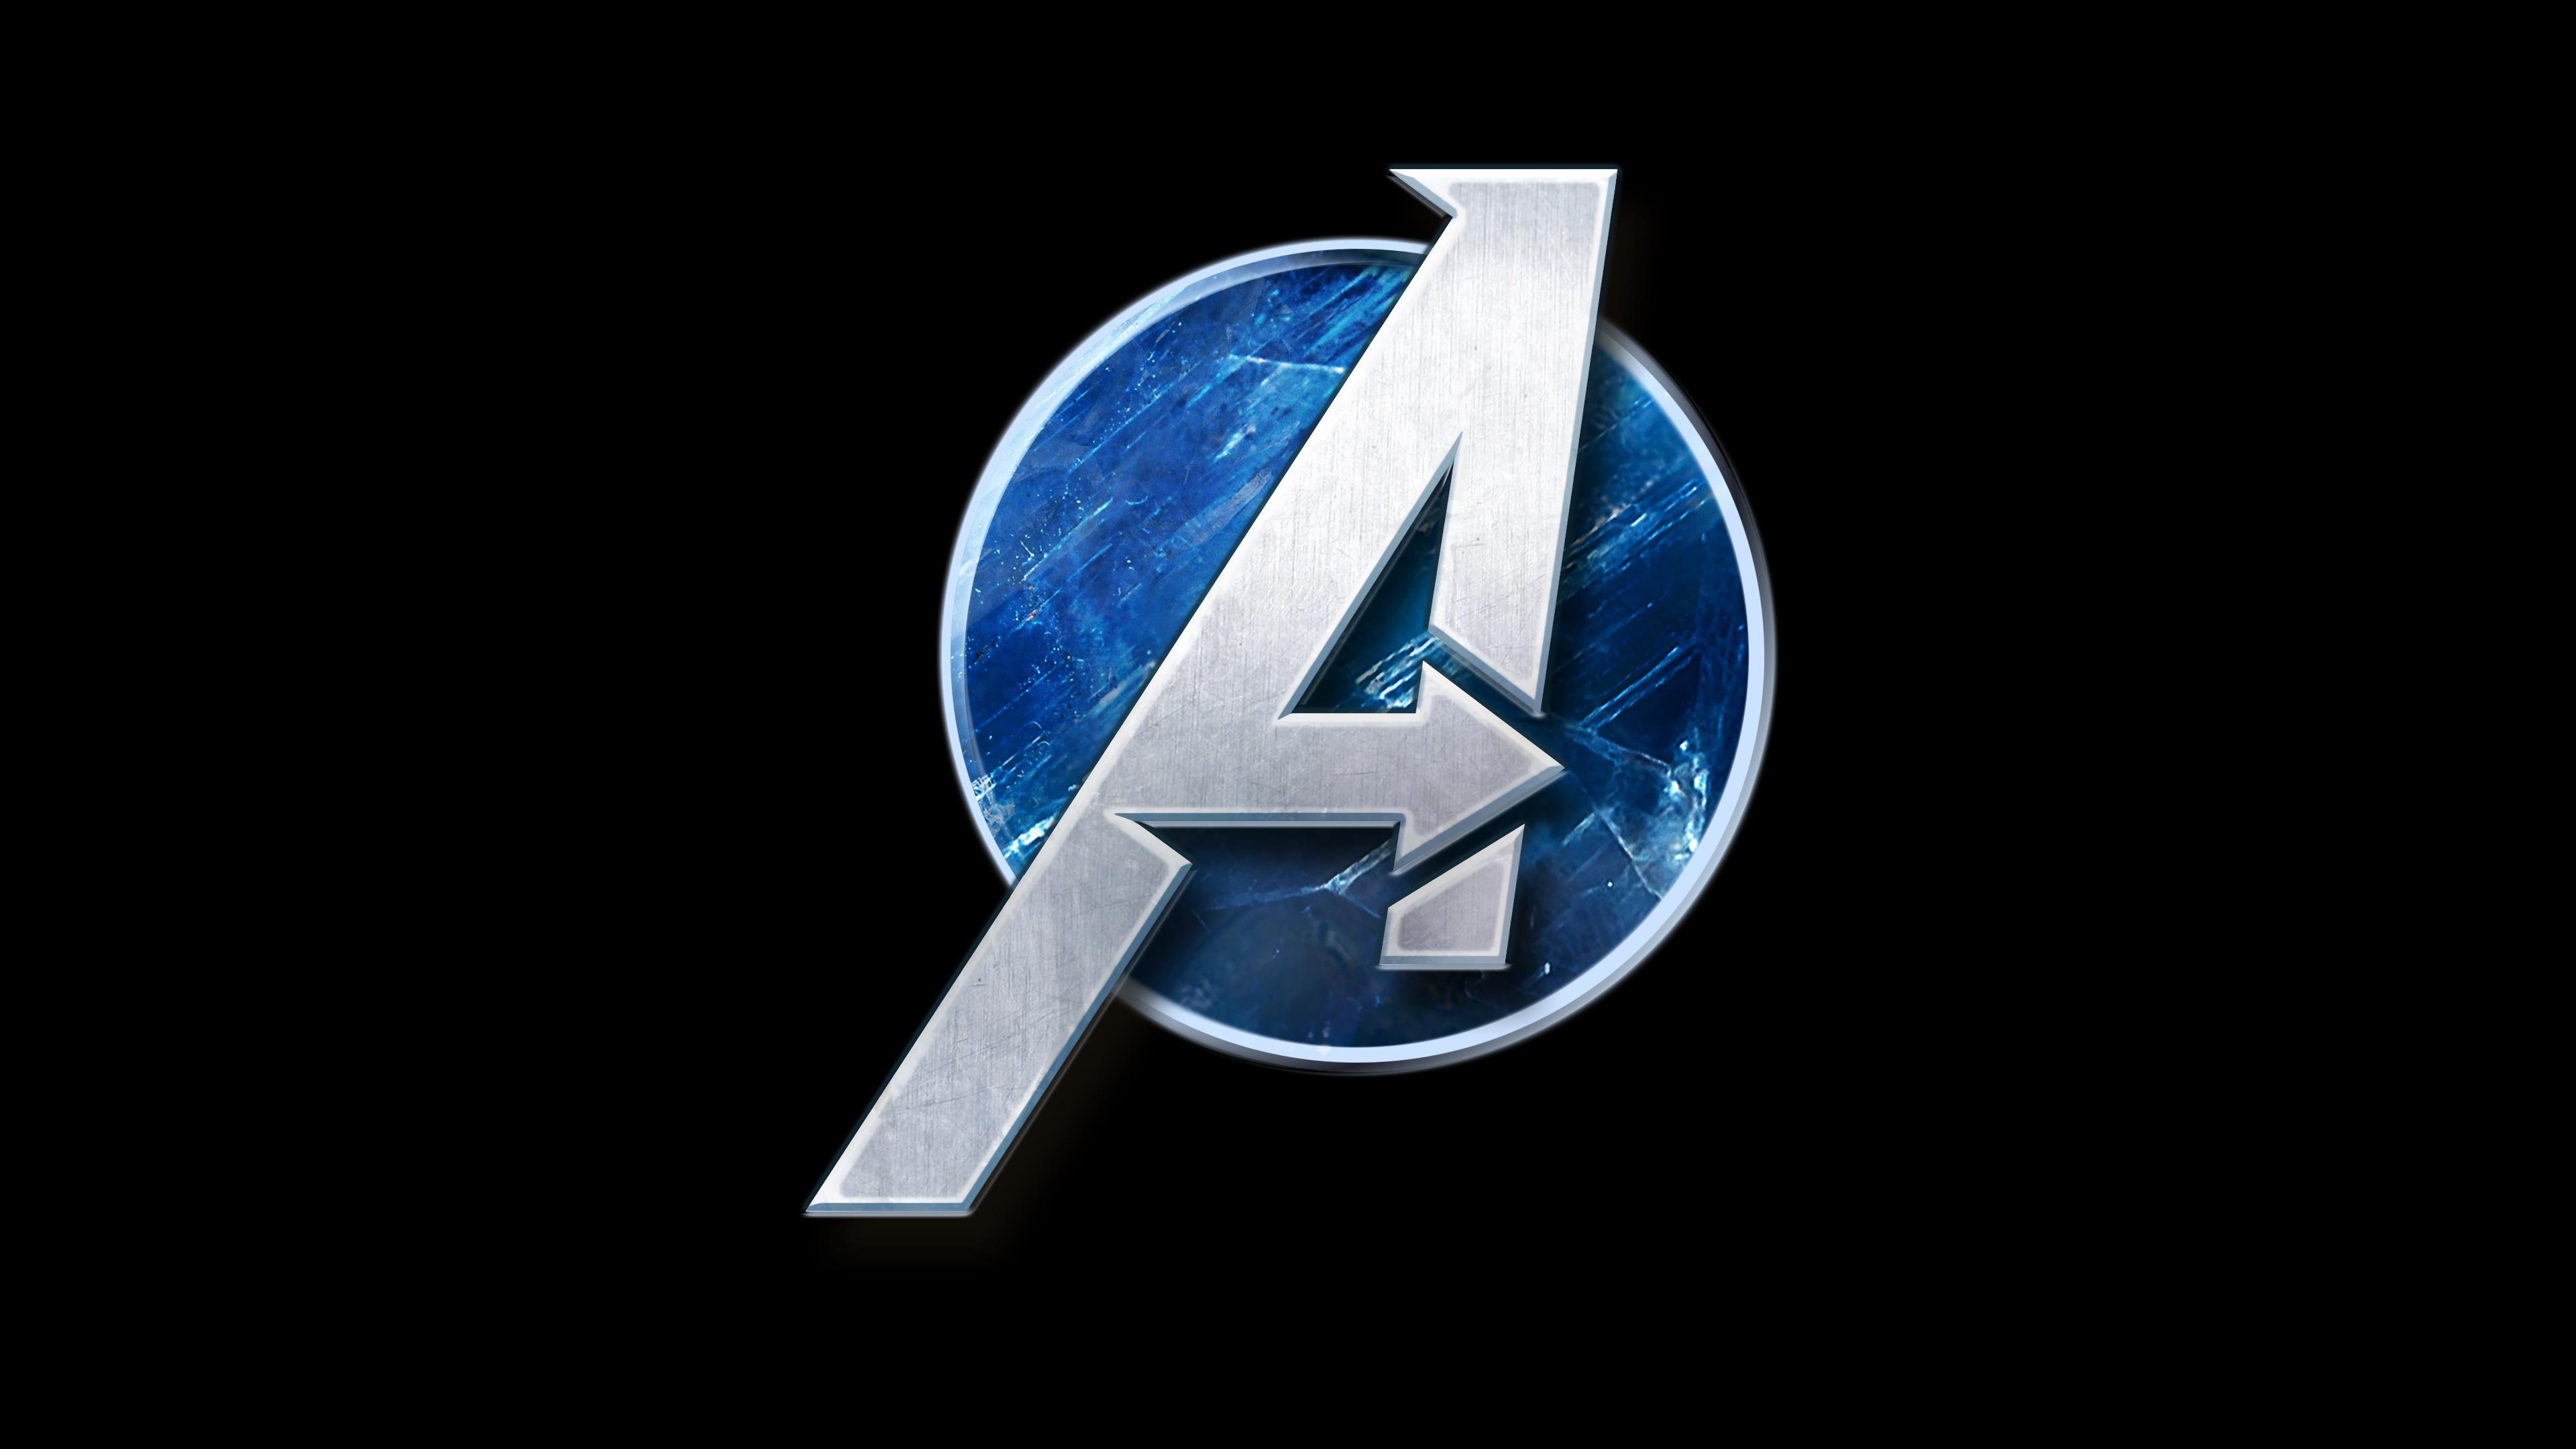 2048x1152 Marvels Avengers Game Logo 2048x1152 Resolution